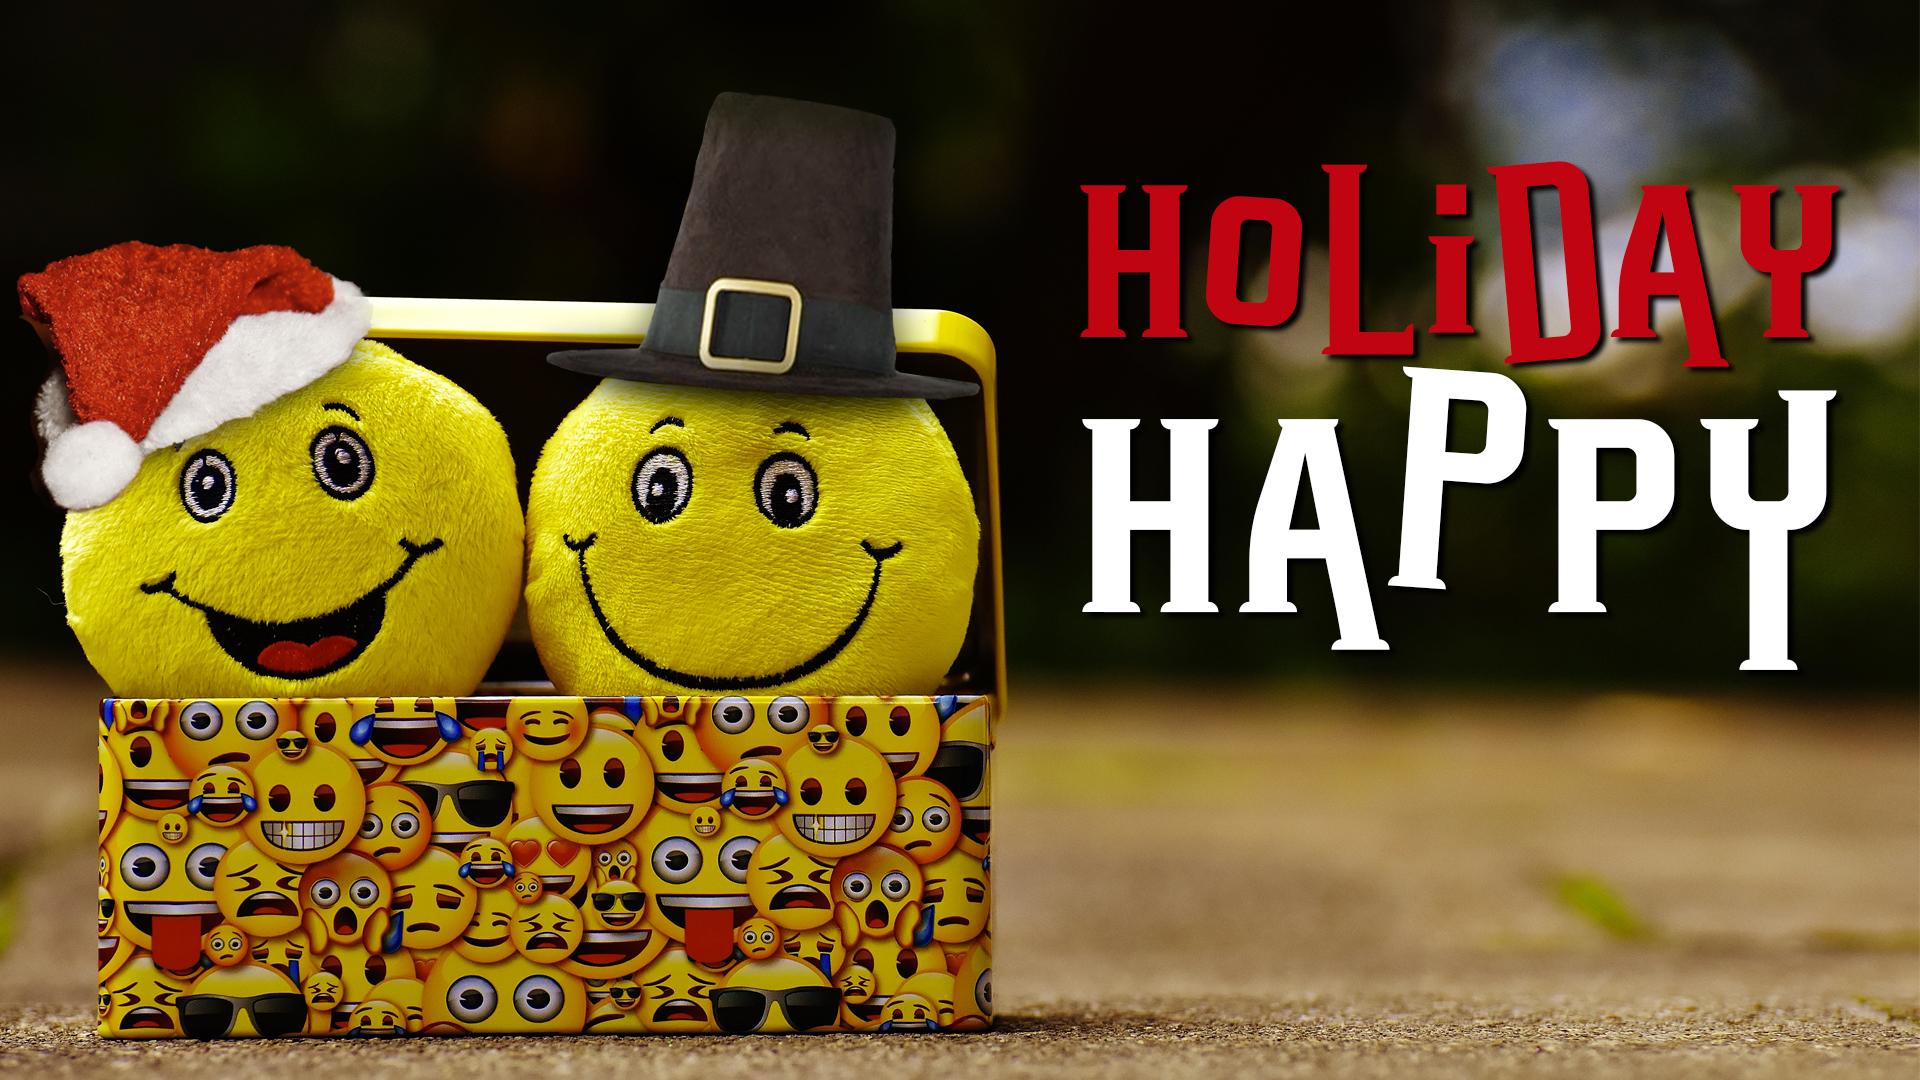 C – Holiday Happy